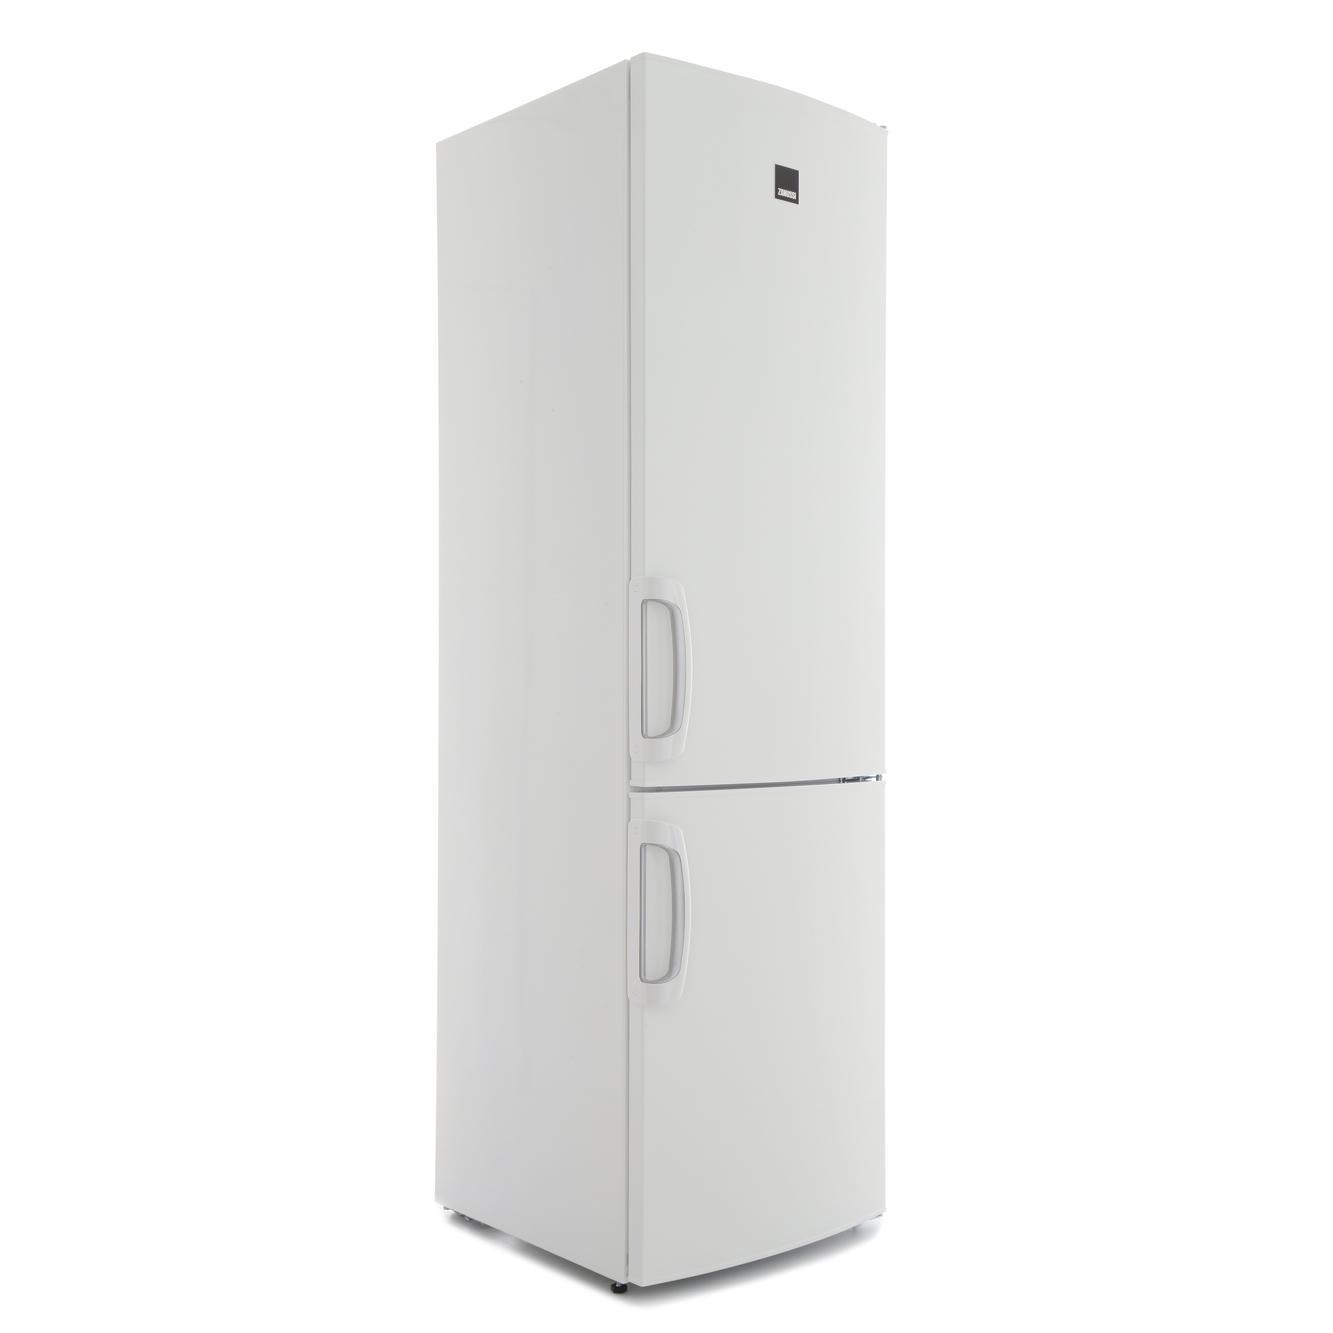 Zanussi ZRB38426WV Fridge Freezer